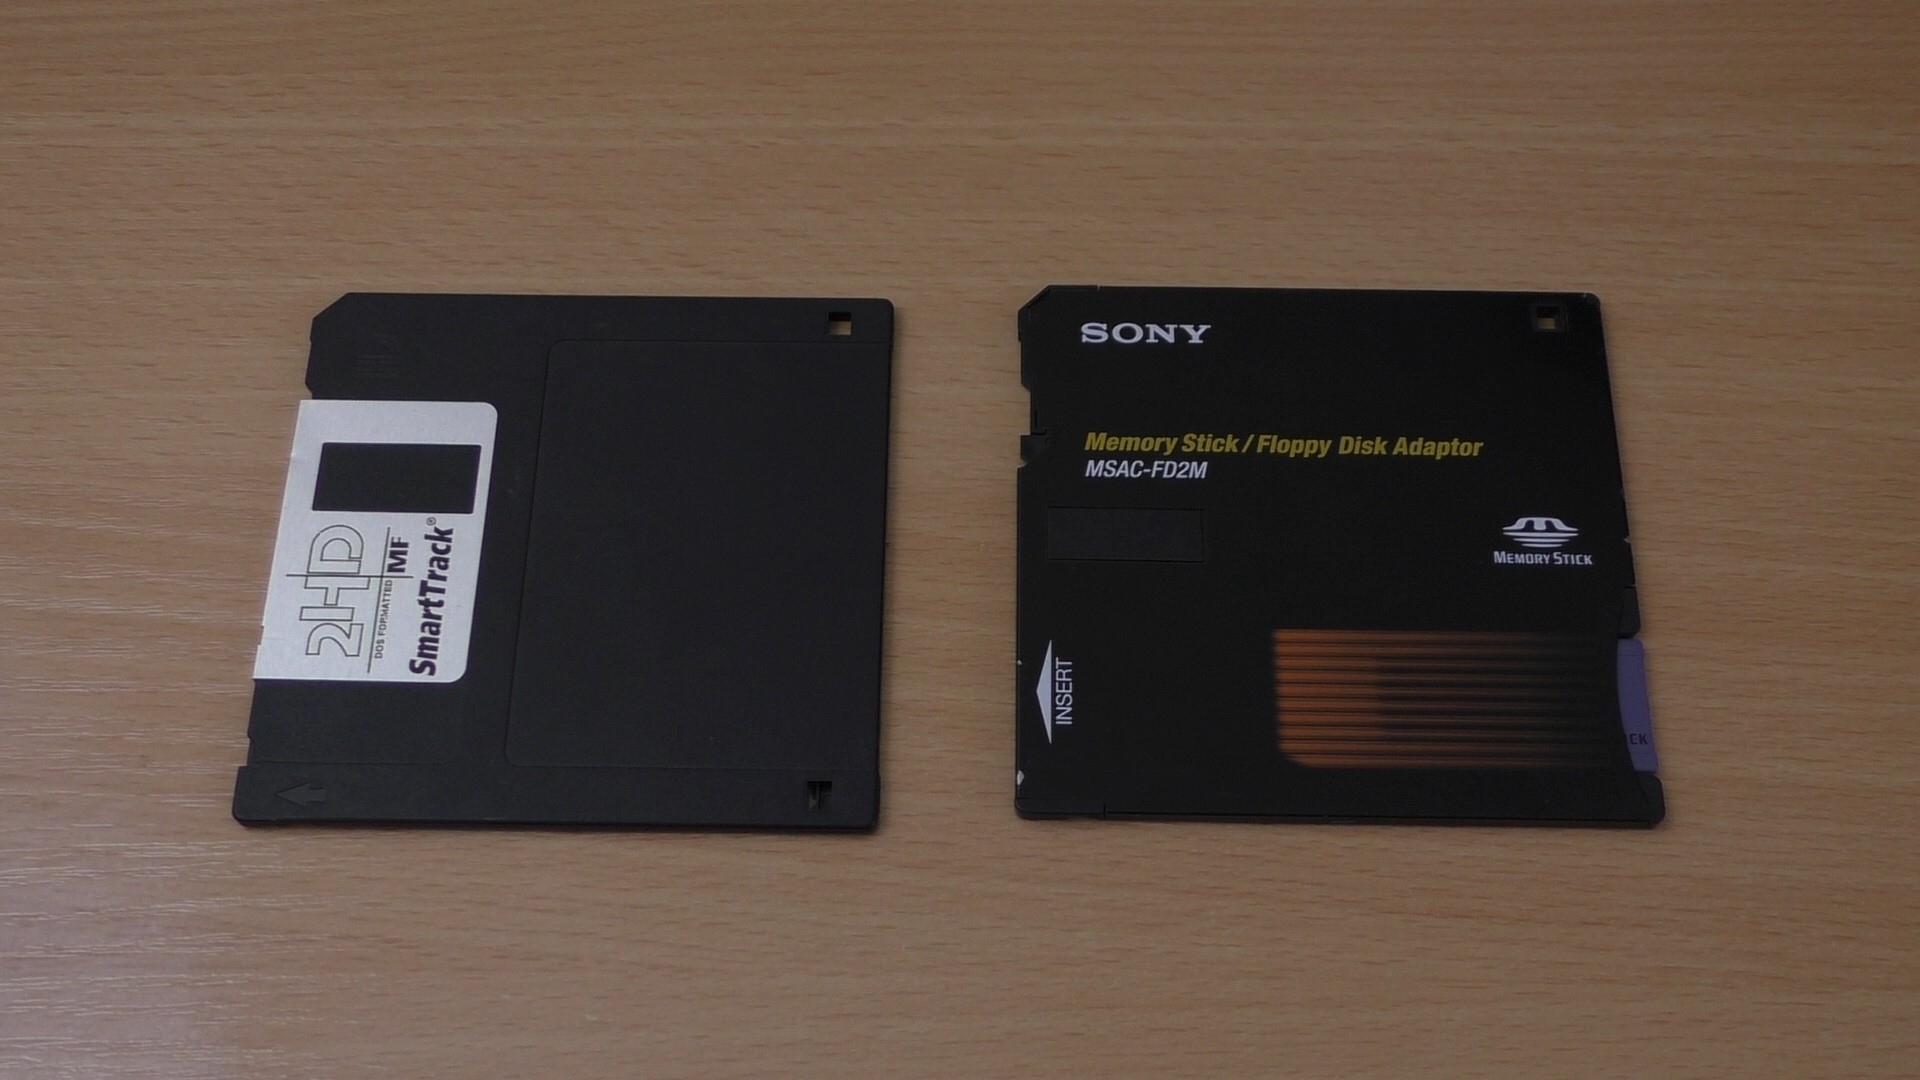 Фотоаппарат на дискетах: 8 интересных фактов о Sony Mavica MVC-FD85 (много картинок) - 21